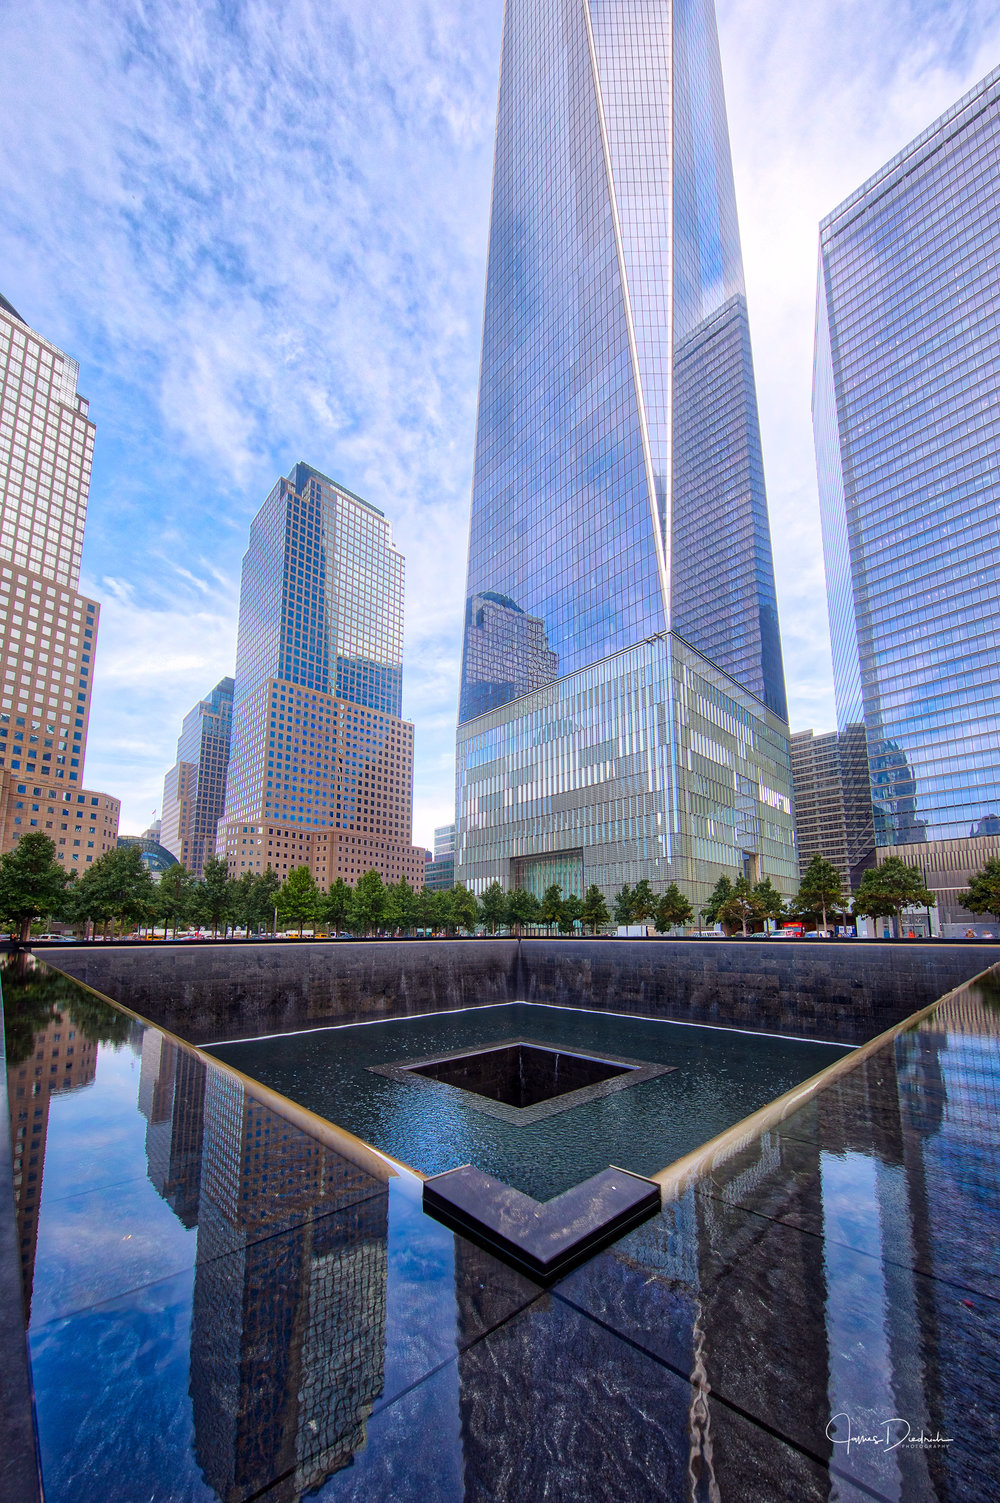 9-11 Memorial NY City.jpg